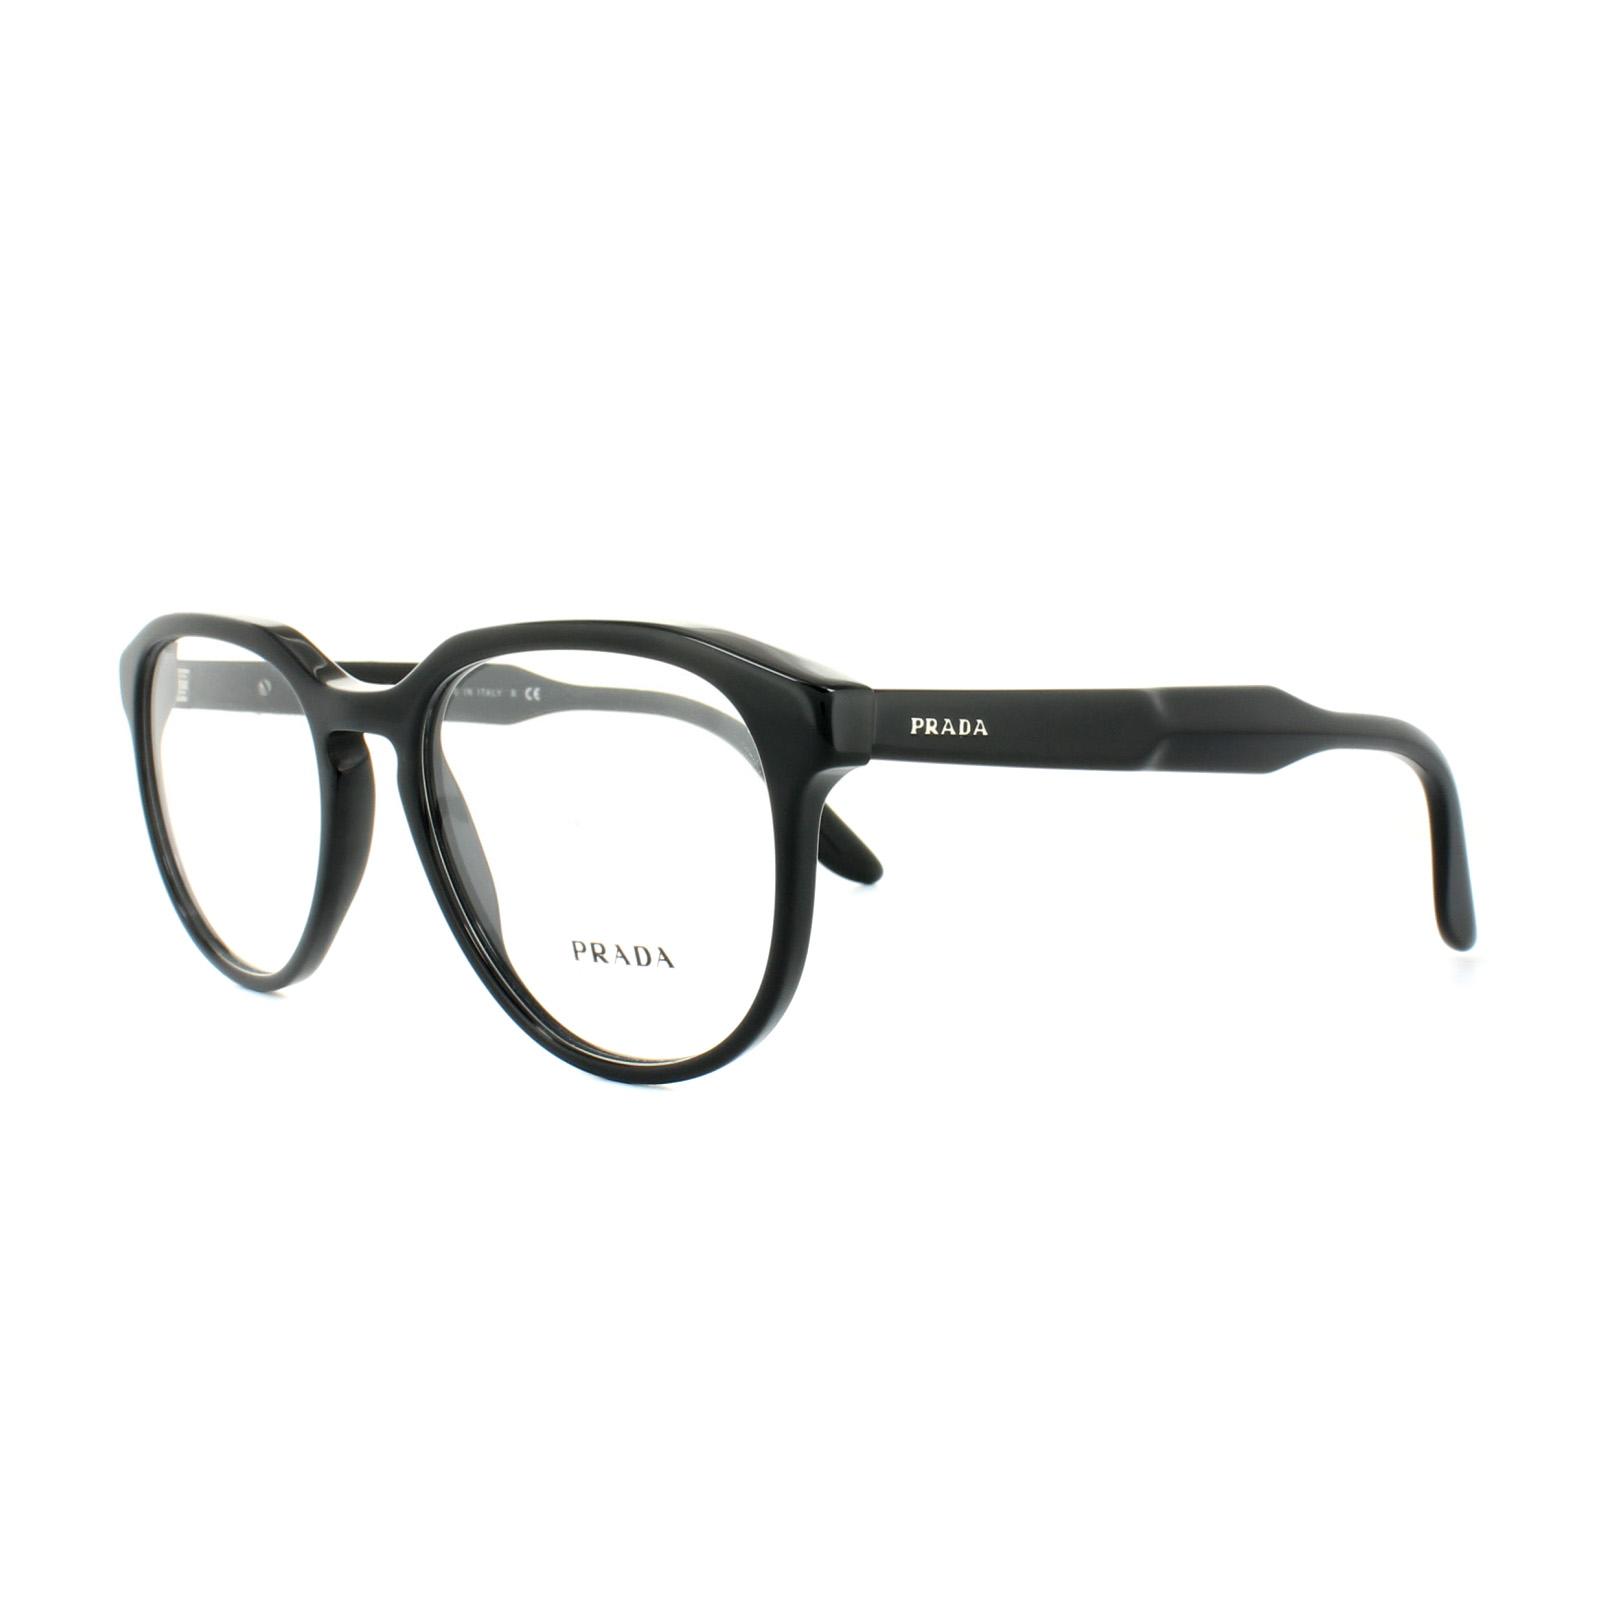 Prada Glasses Frames PR 18SV 1AB1O1 Black Mens 53mm 8053672495263 | eBay